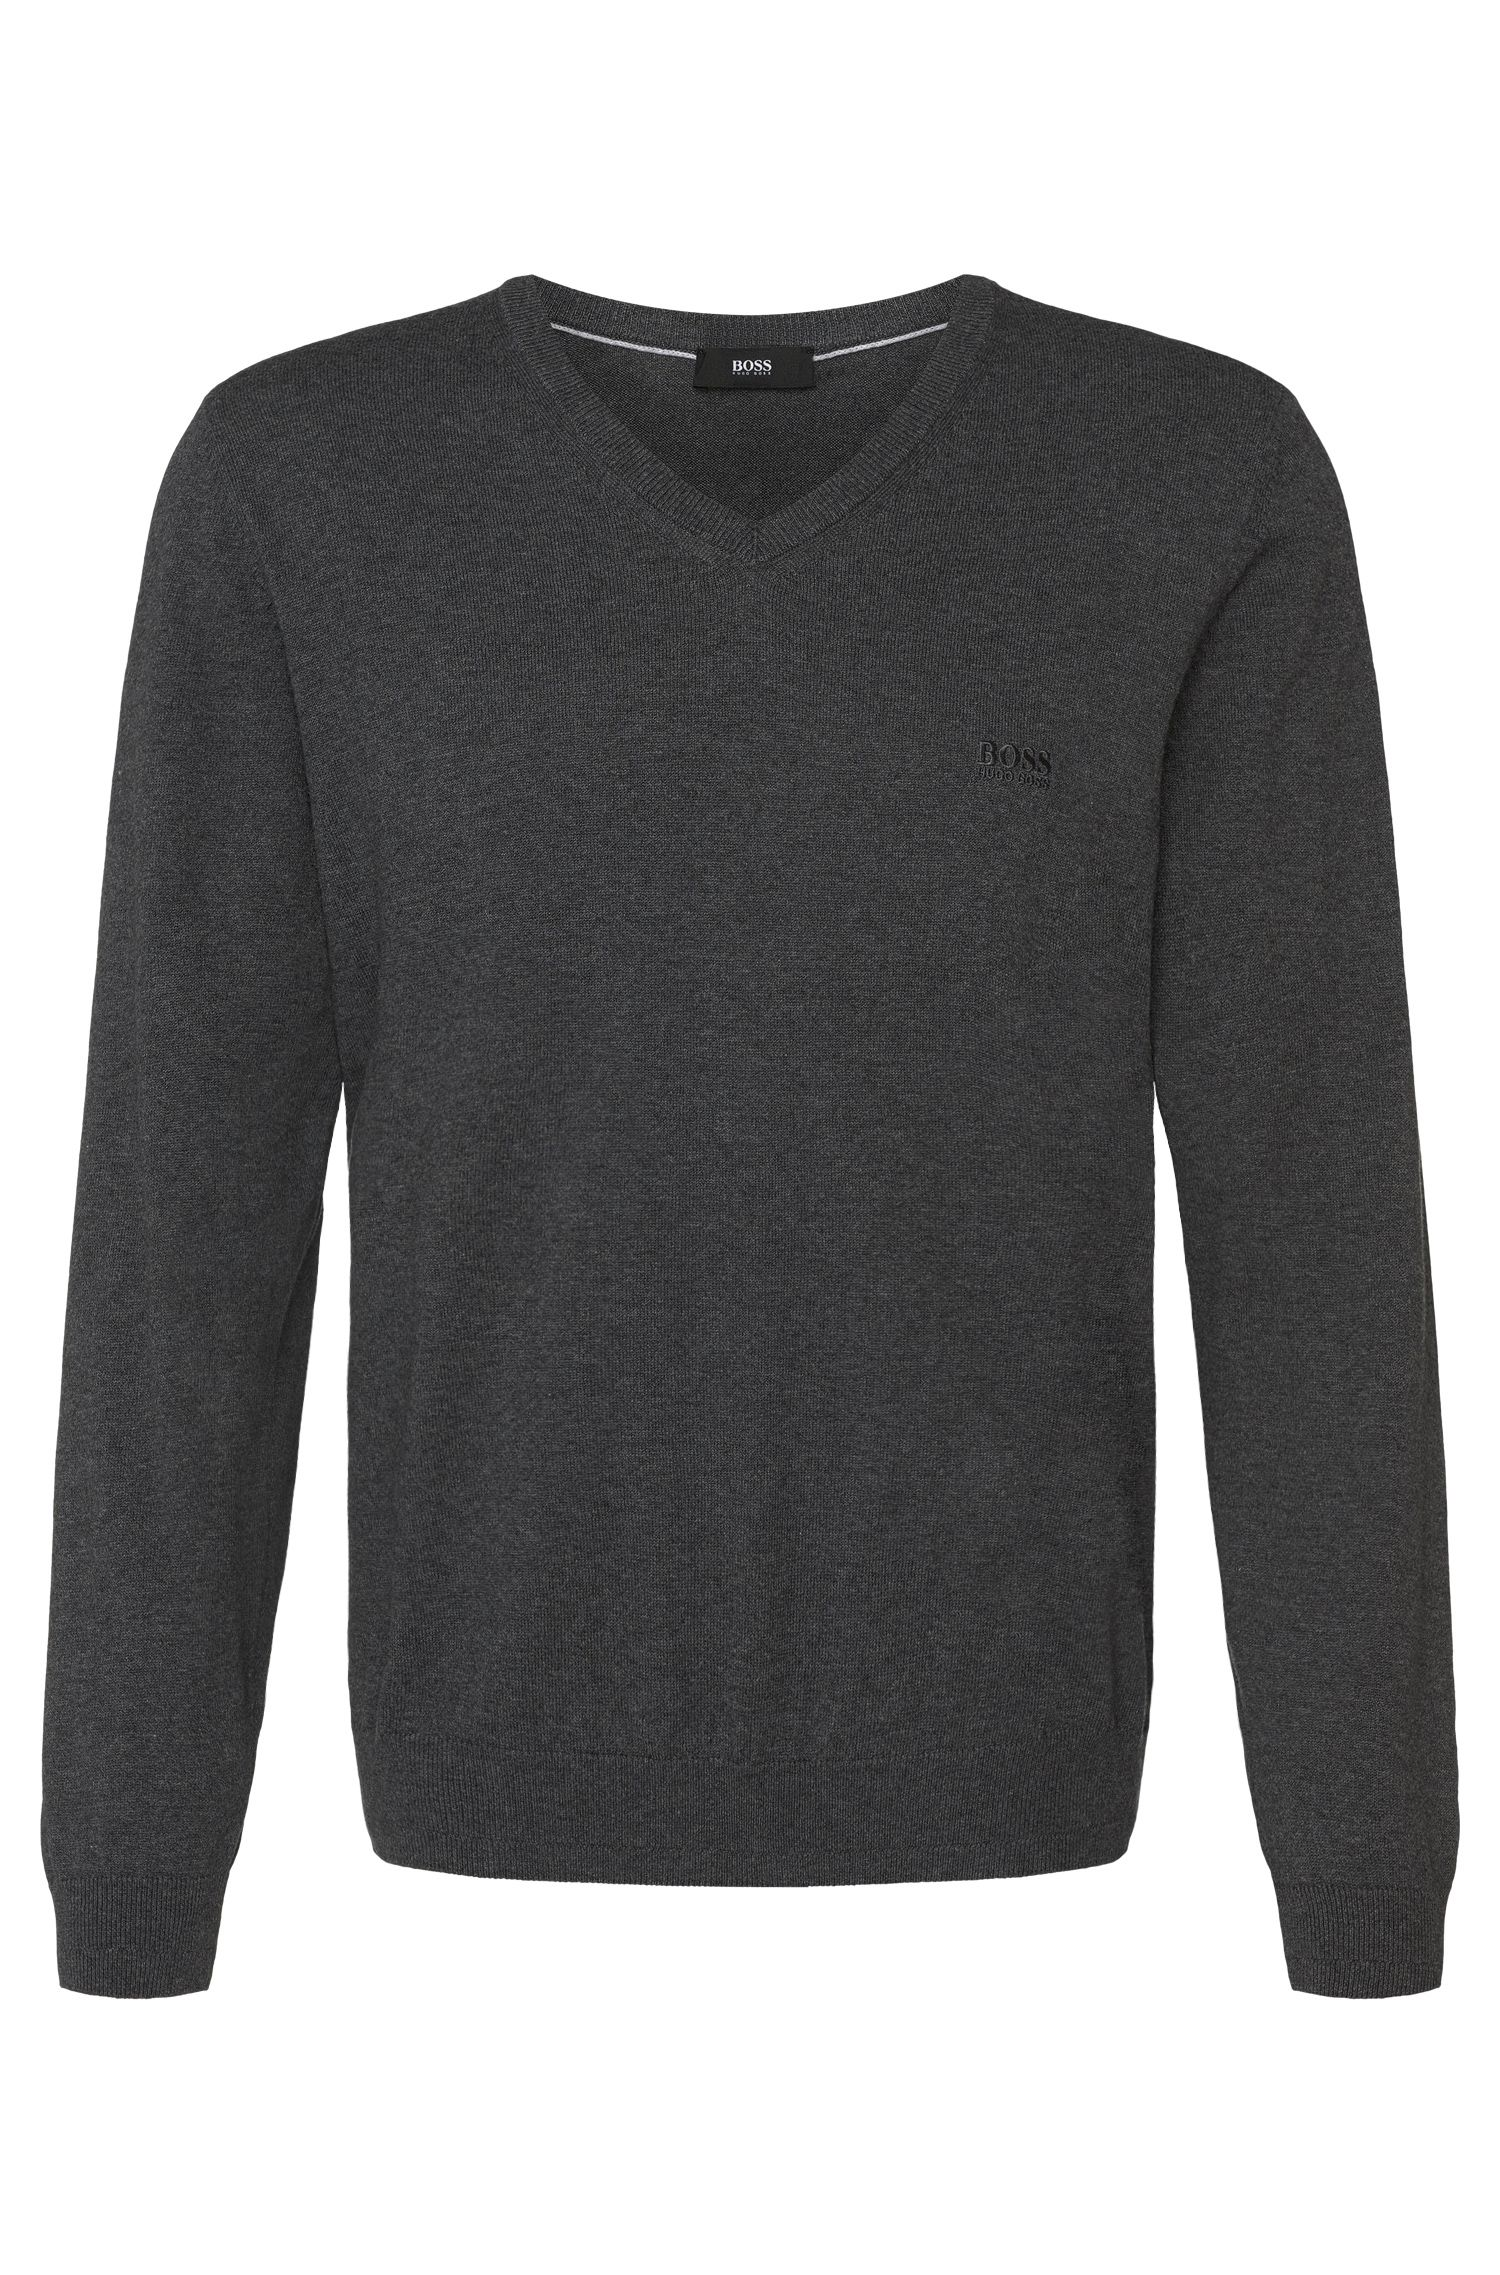 Unifarbener Pullover aus Baumwolle: 'Filipp'